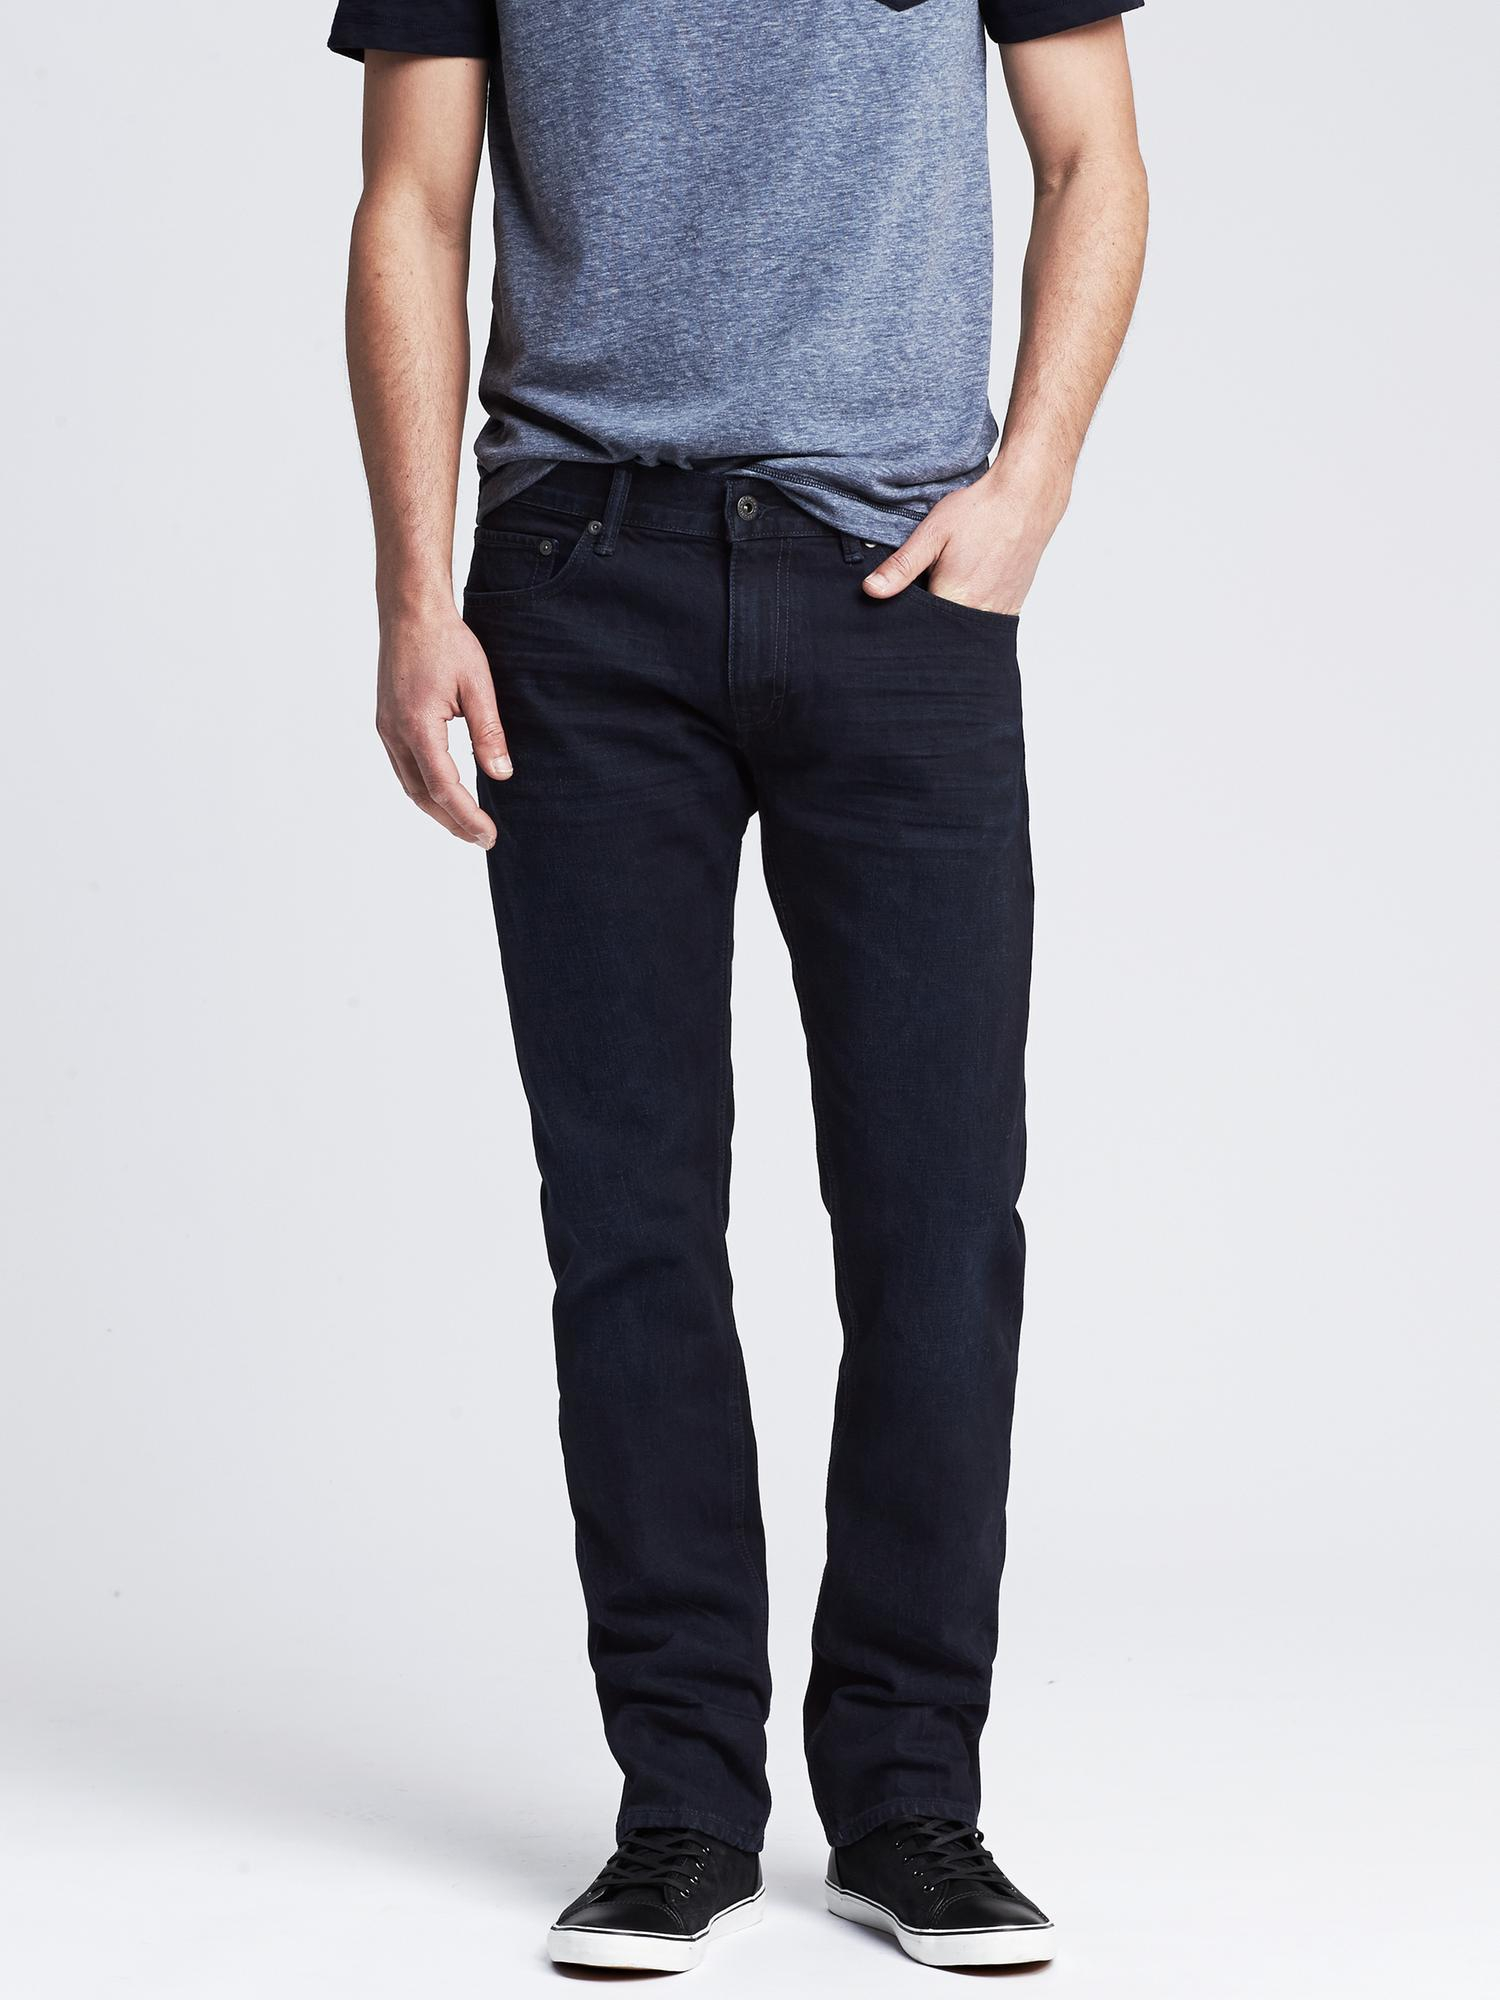 Levi Jeans Tall Women